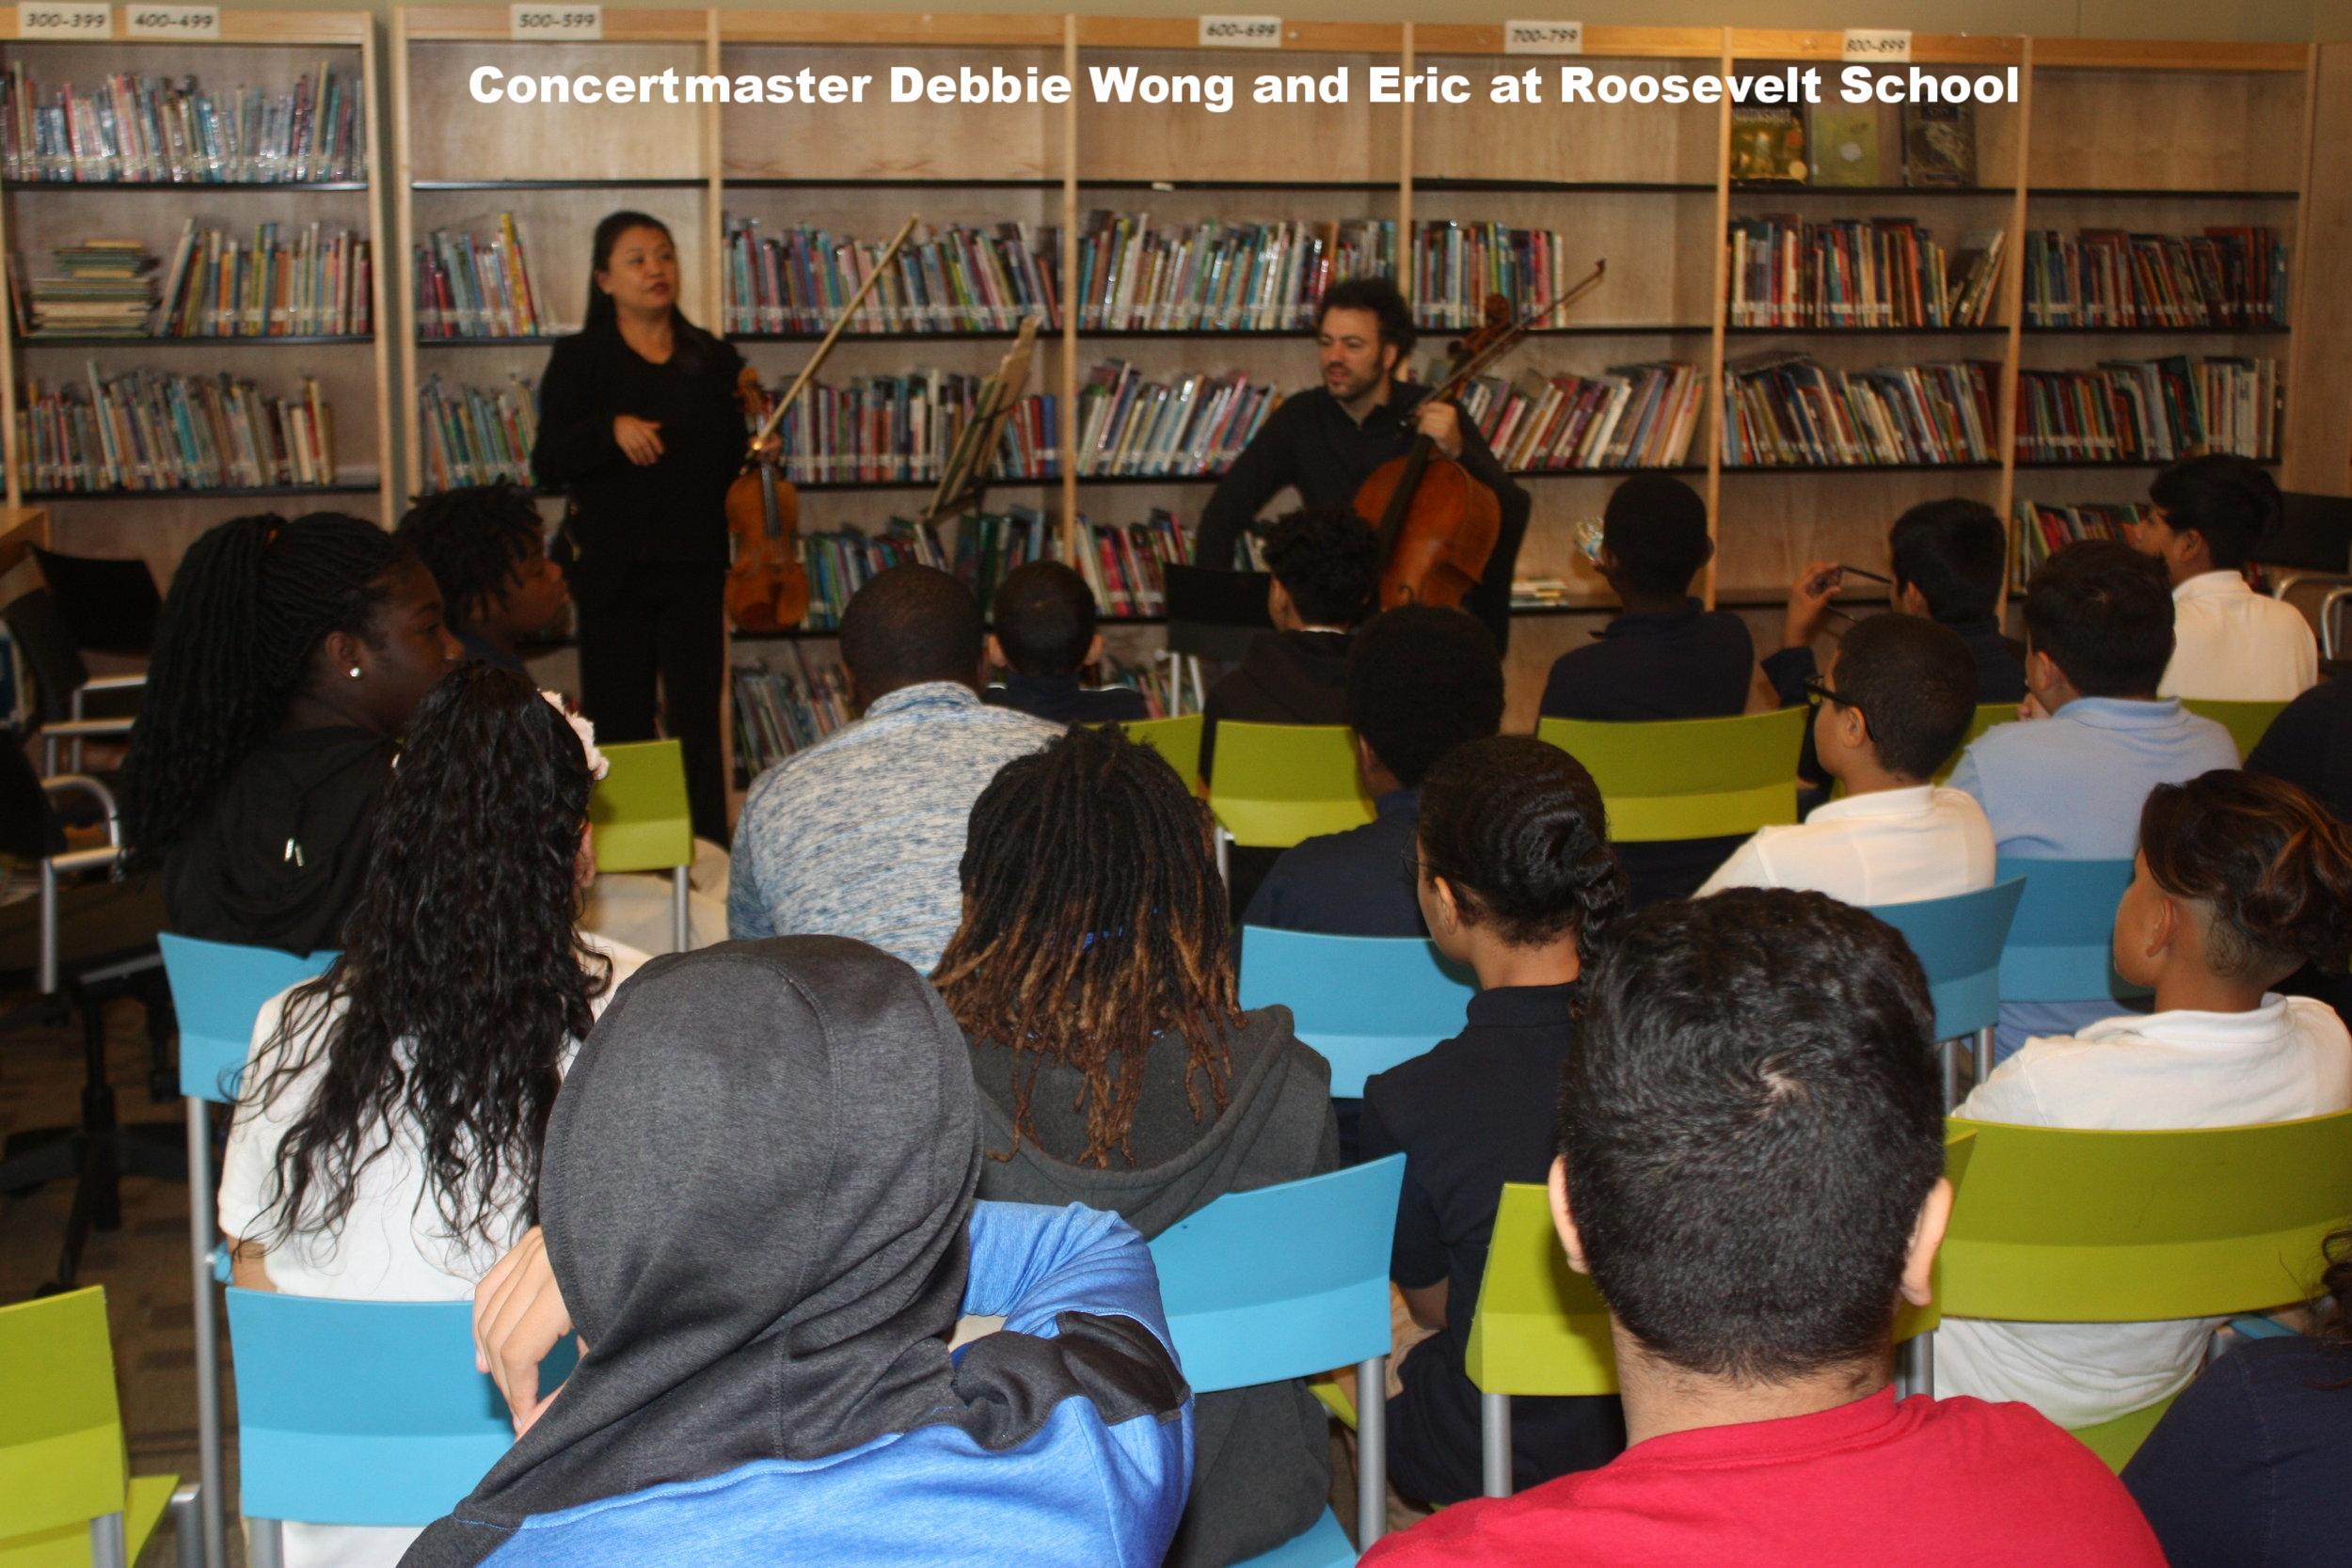 GBS 18-09-21 Roosevelt School (2).JPG